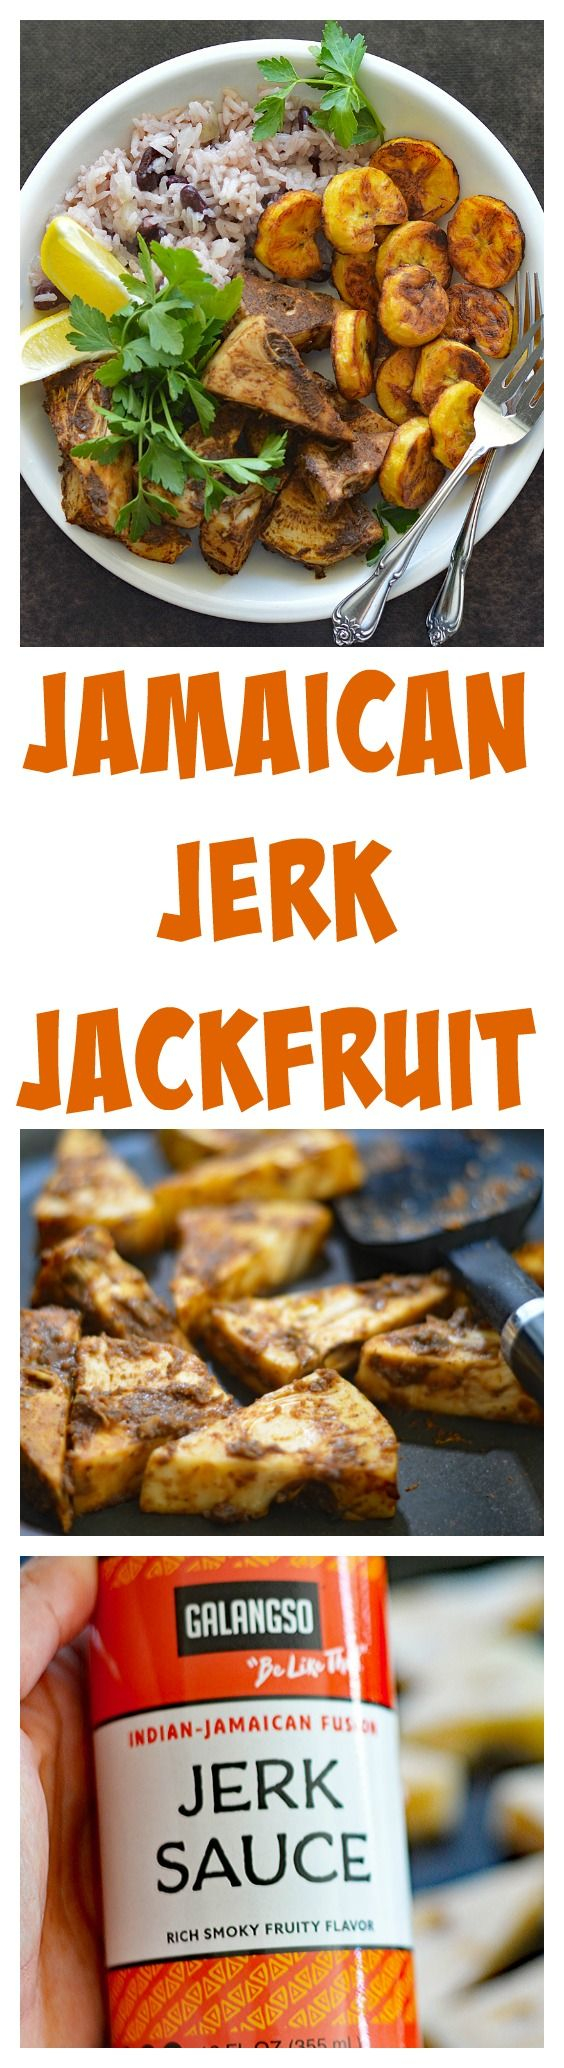 Jamaican Jerk Jackfruit with Rice and Beans